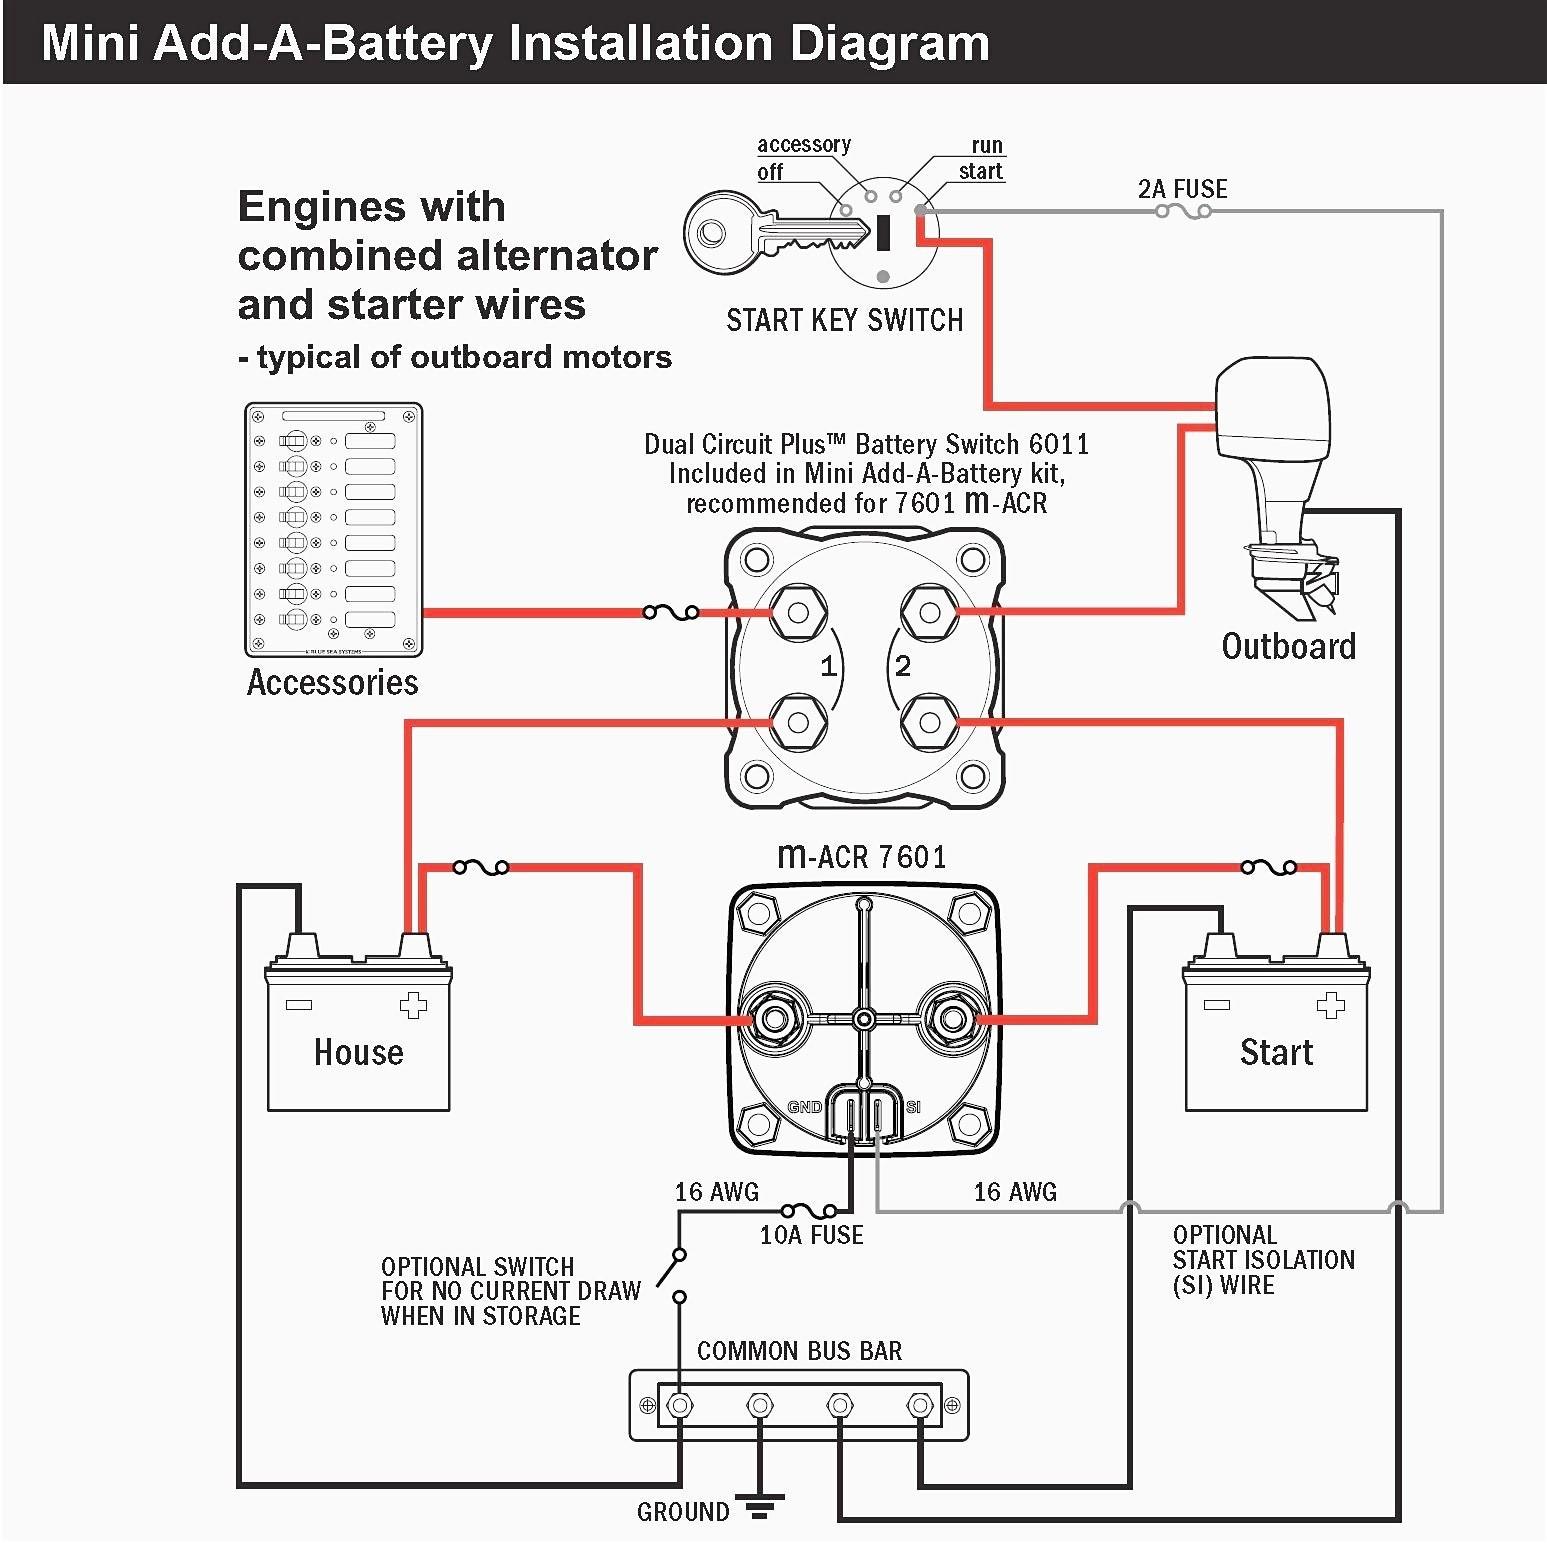 dual rv battery wiring diagram best of wiring diagram image rh mainetreasurechest com rv battery wiring diagram rv battery wiring diagram